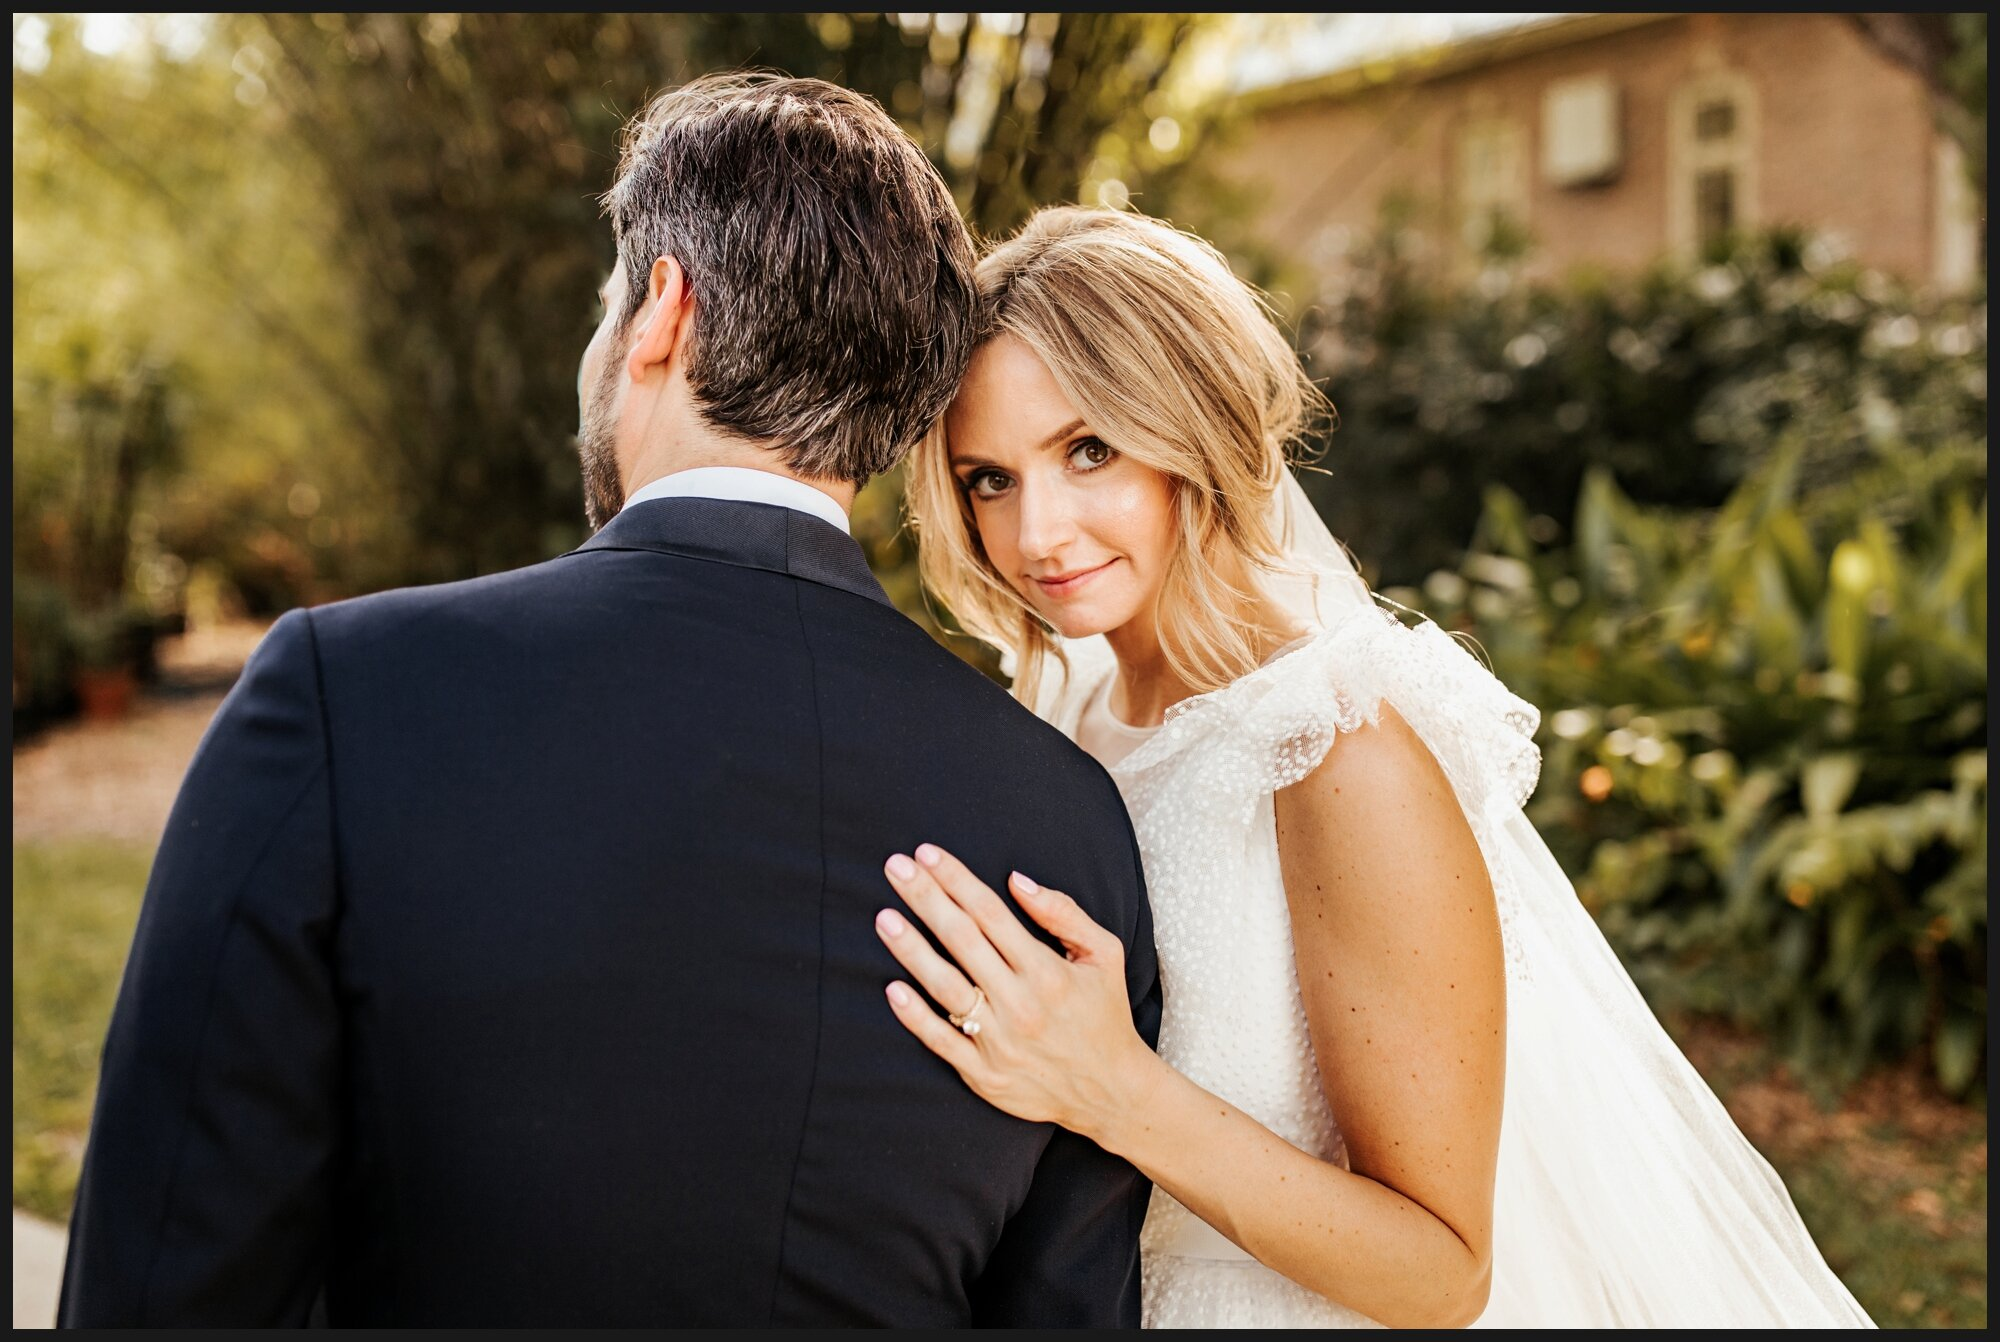 Orlando-Wedding-Photographer-destination-wedding-photographer-florida-wedding-photographer-hawaii-wedding-photographer_0760.jpg